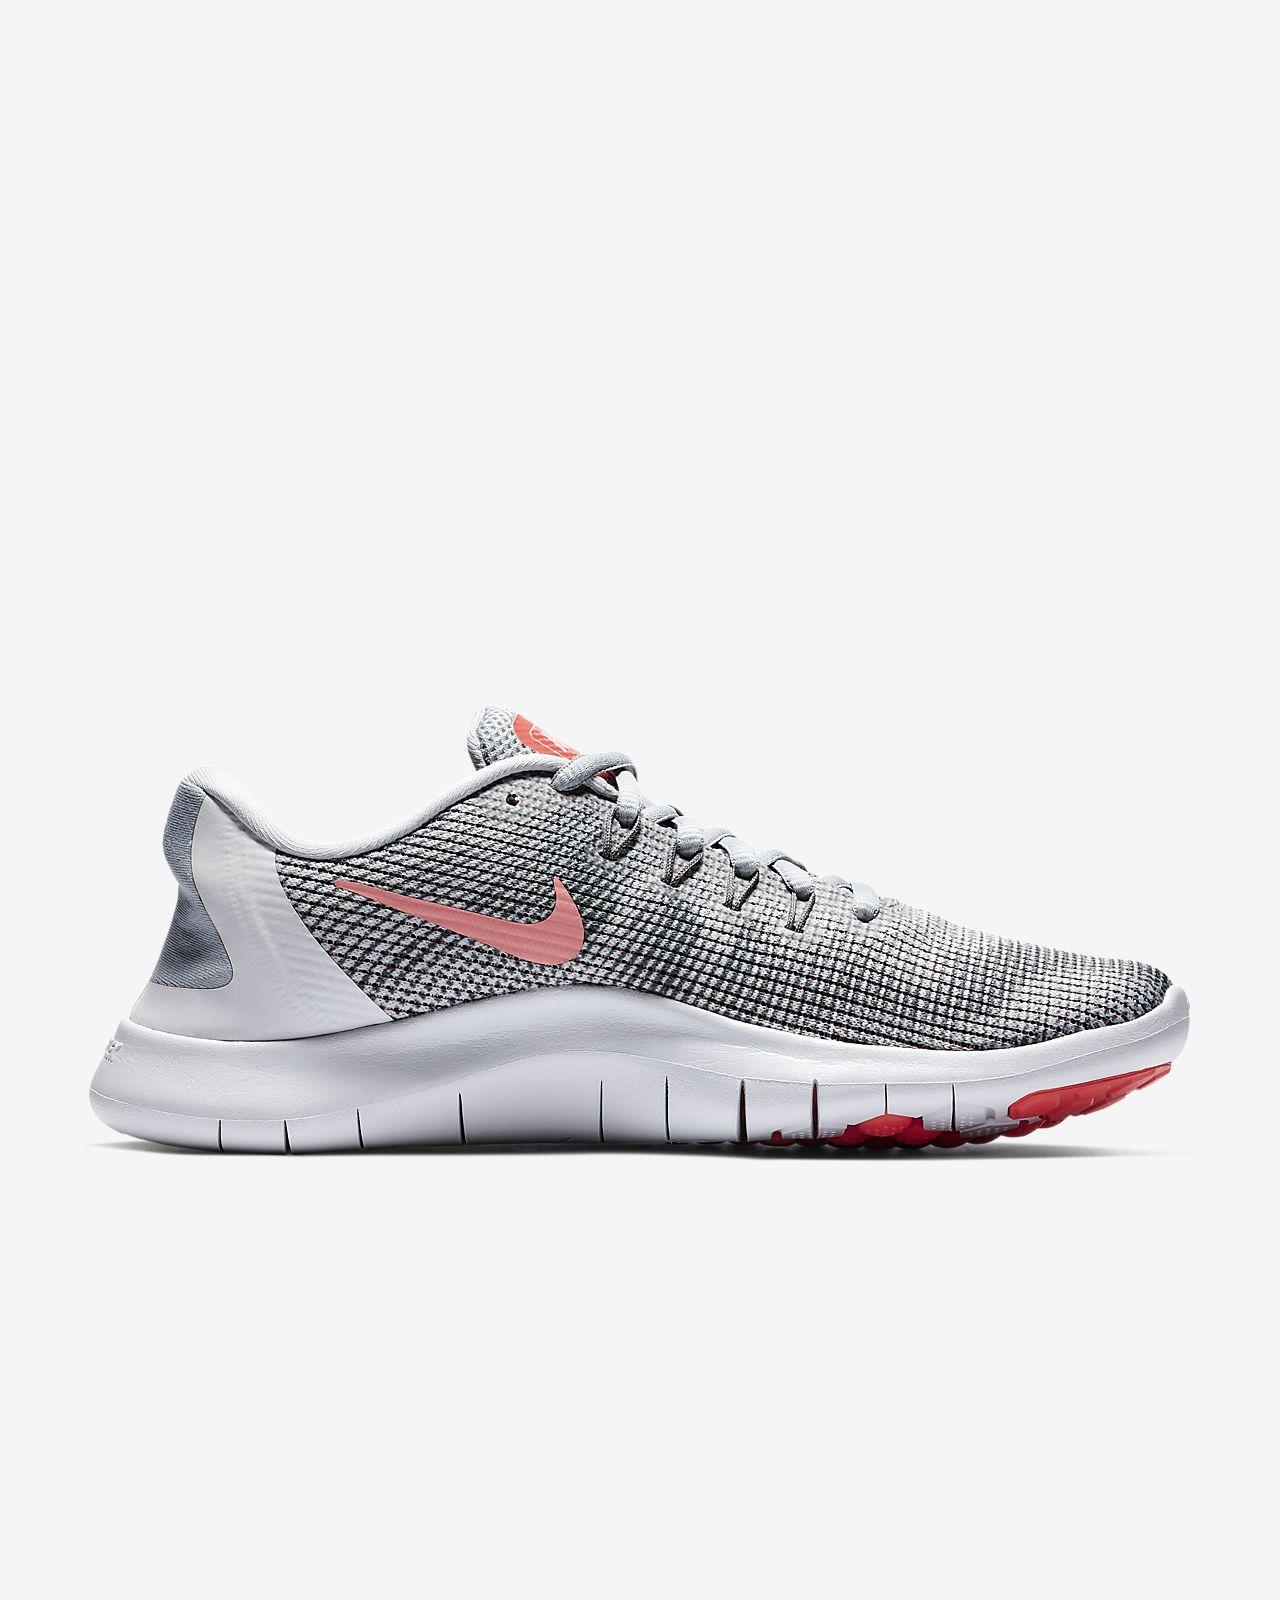 8029db88d775 Nike Flex RN 2018 Women s Running Shoe. Nike.com NZ